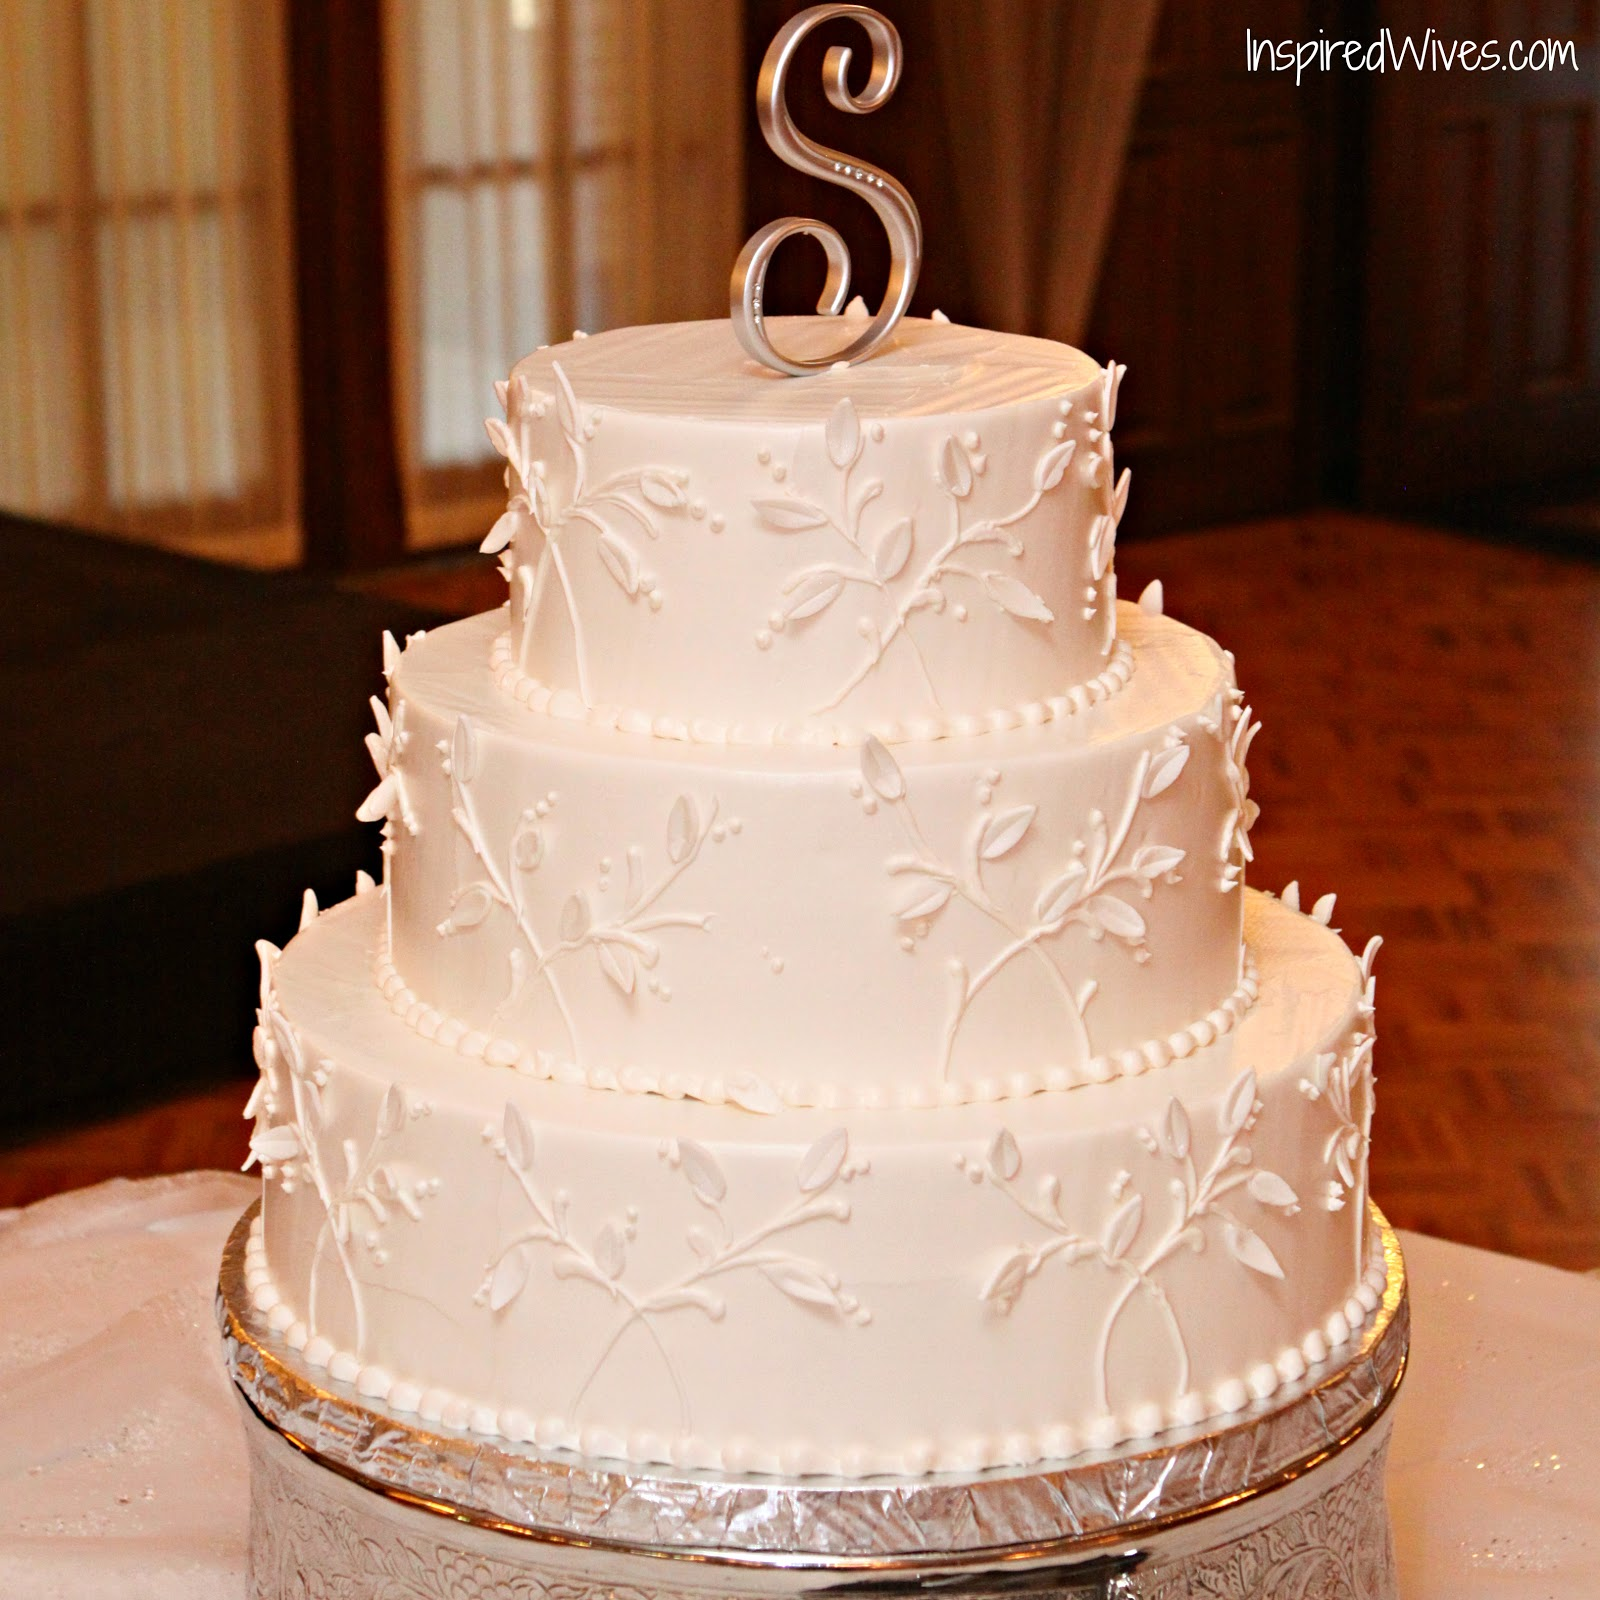 inspired i dos design your perfect wedding cake. Black Bedroom Furniture Sets. Home Design Ideas